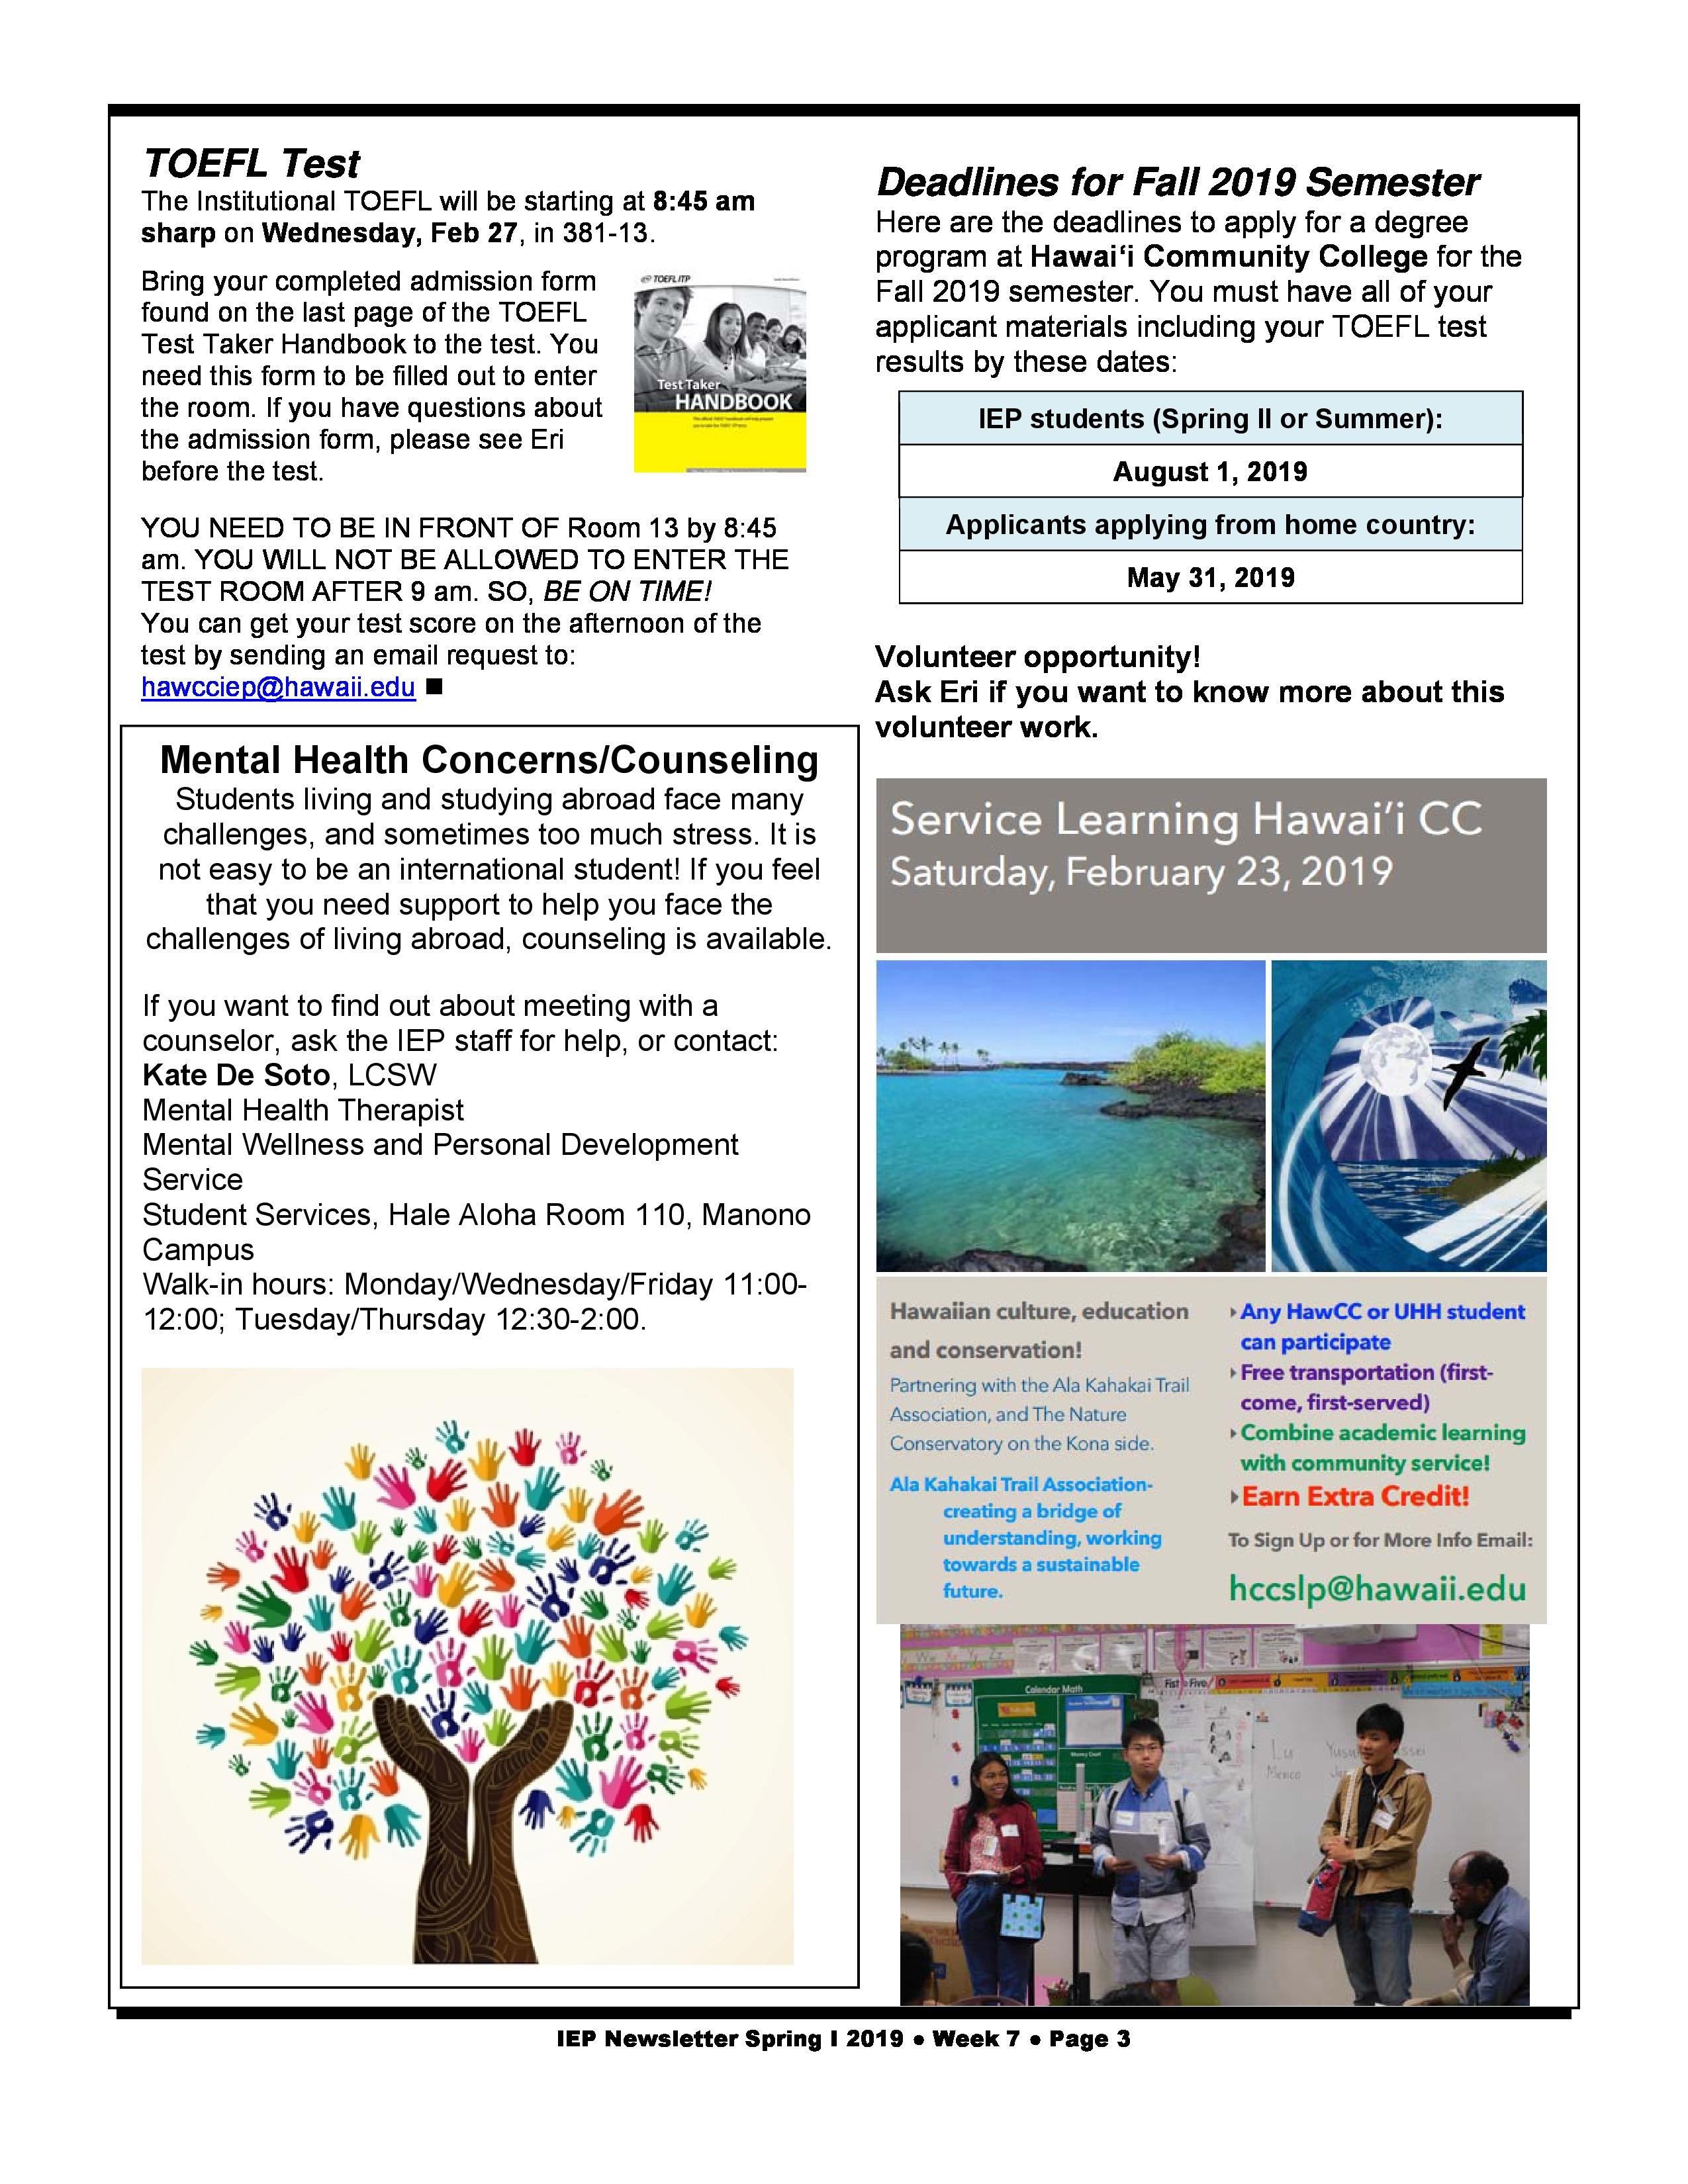 Friday August 1st Free Community >> Spring I 2019 Newsletter Week 7 Intensive English Program